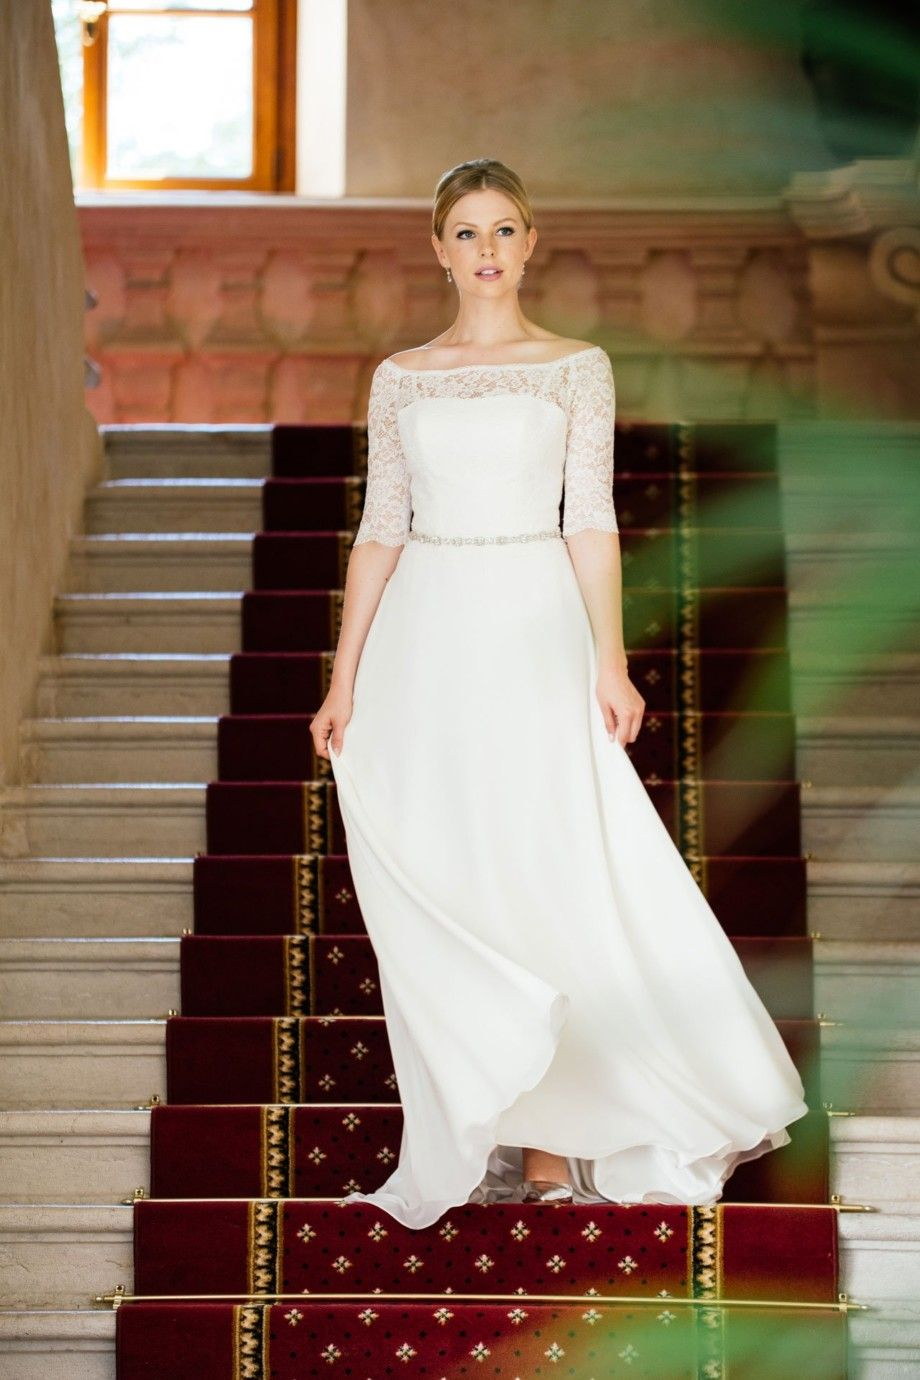 Brautkleid Spitze Ärmel – Vintage Bolero Look – Pola | Zukünftige ...